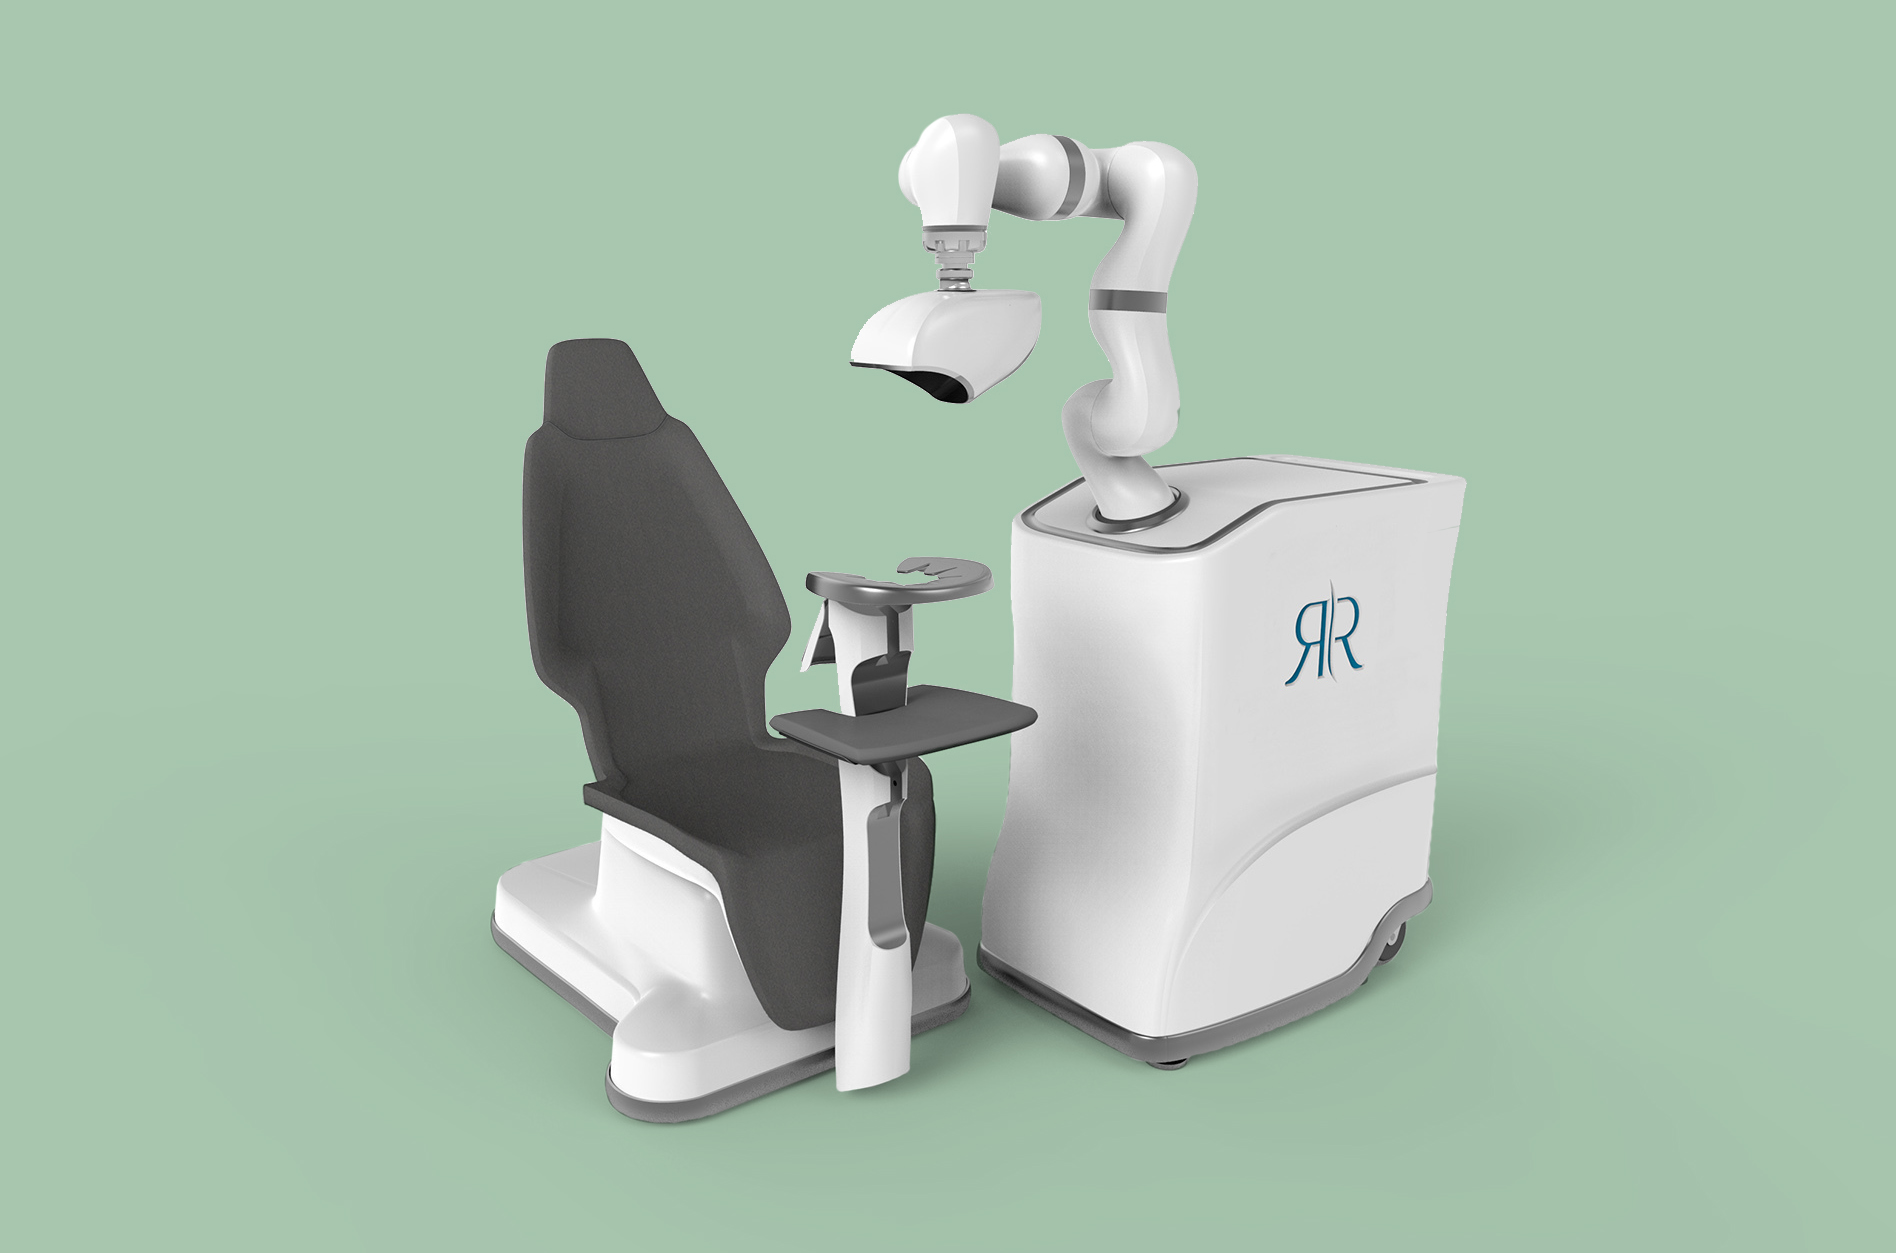 Restoration Robotics Hair Transplant Seating